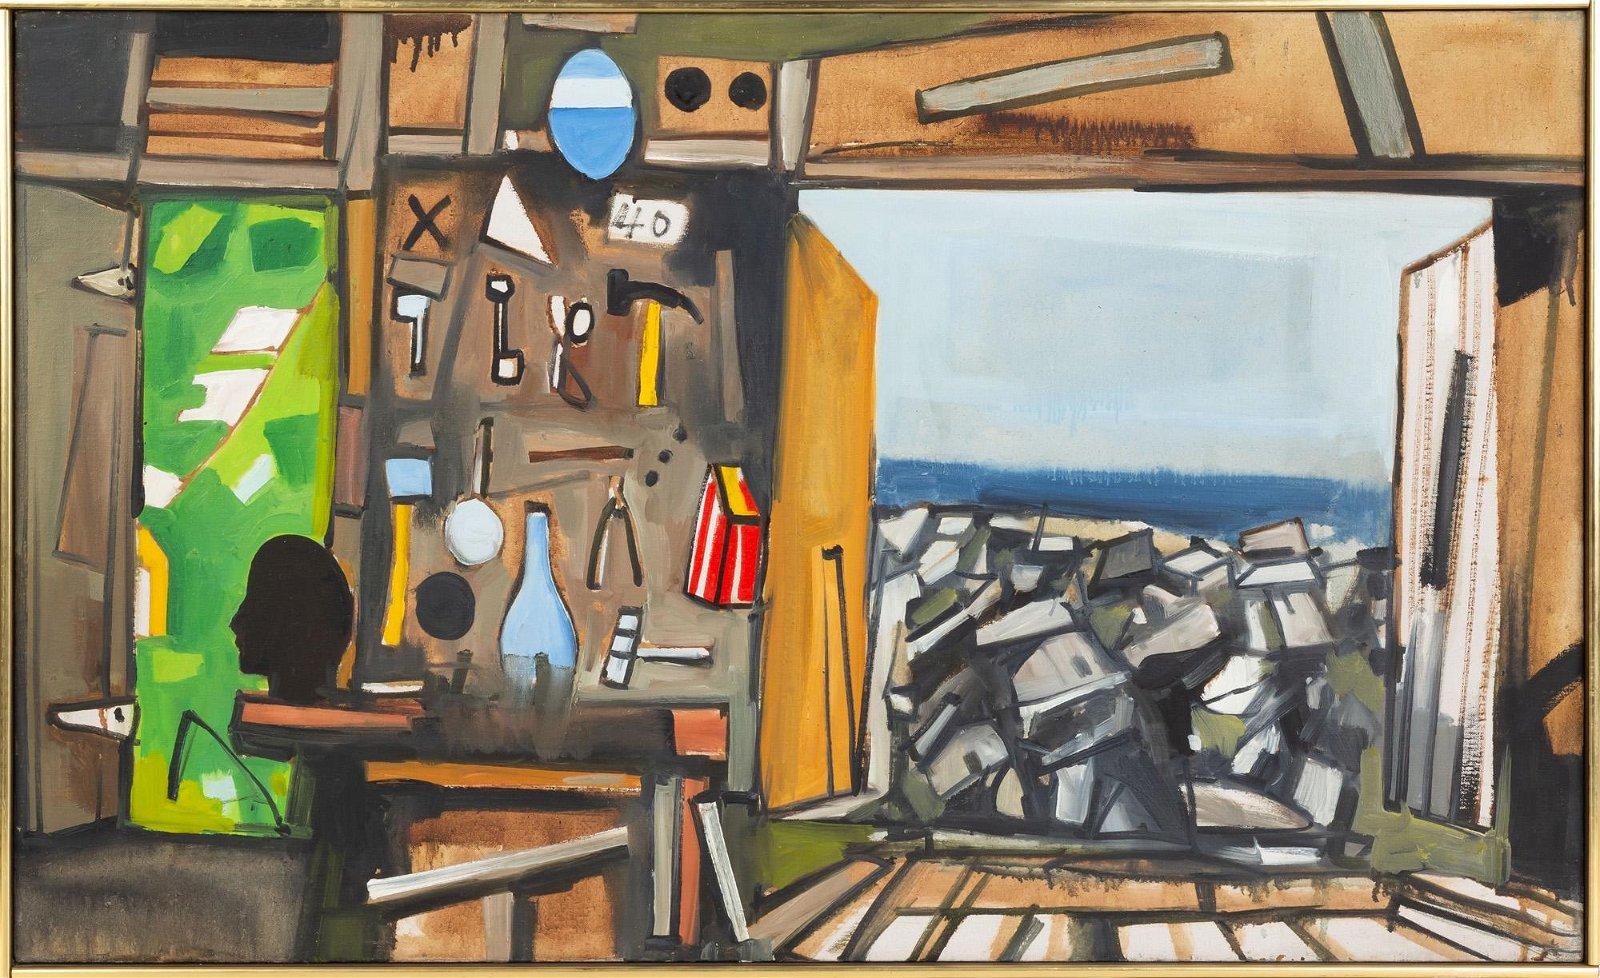 John Hultberg (American, 1922-2005) Untitled